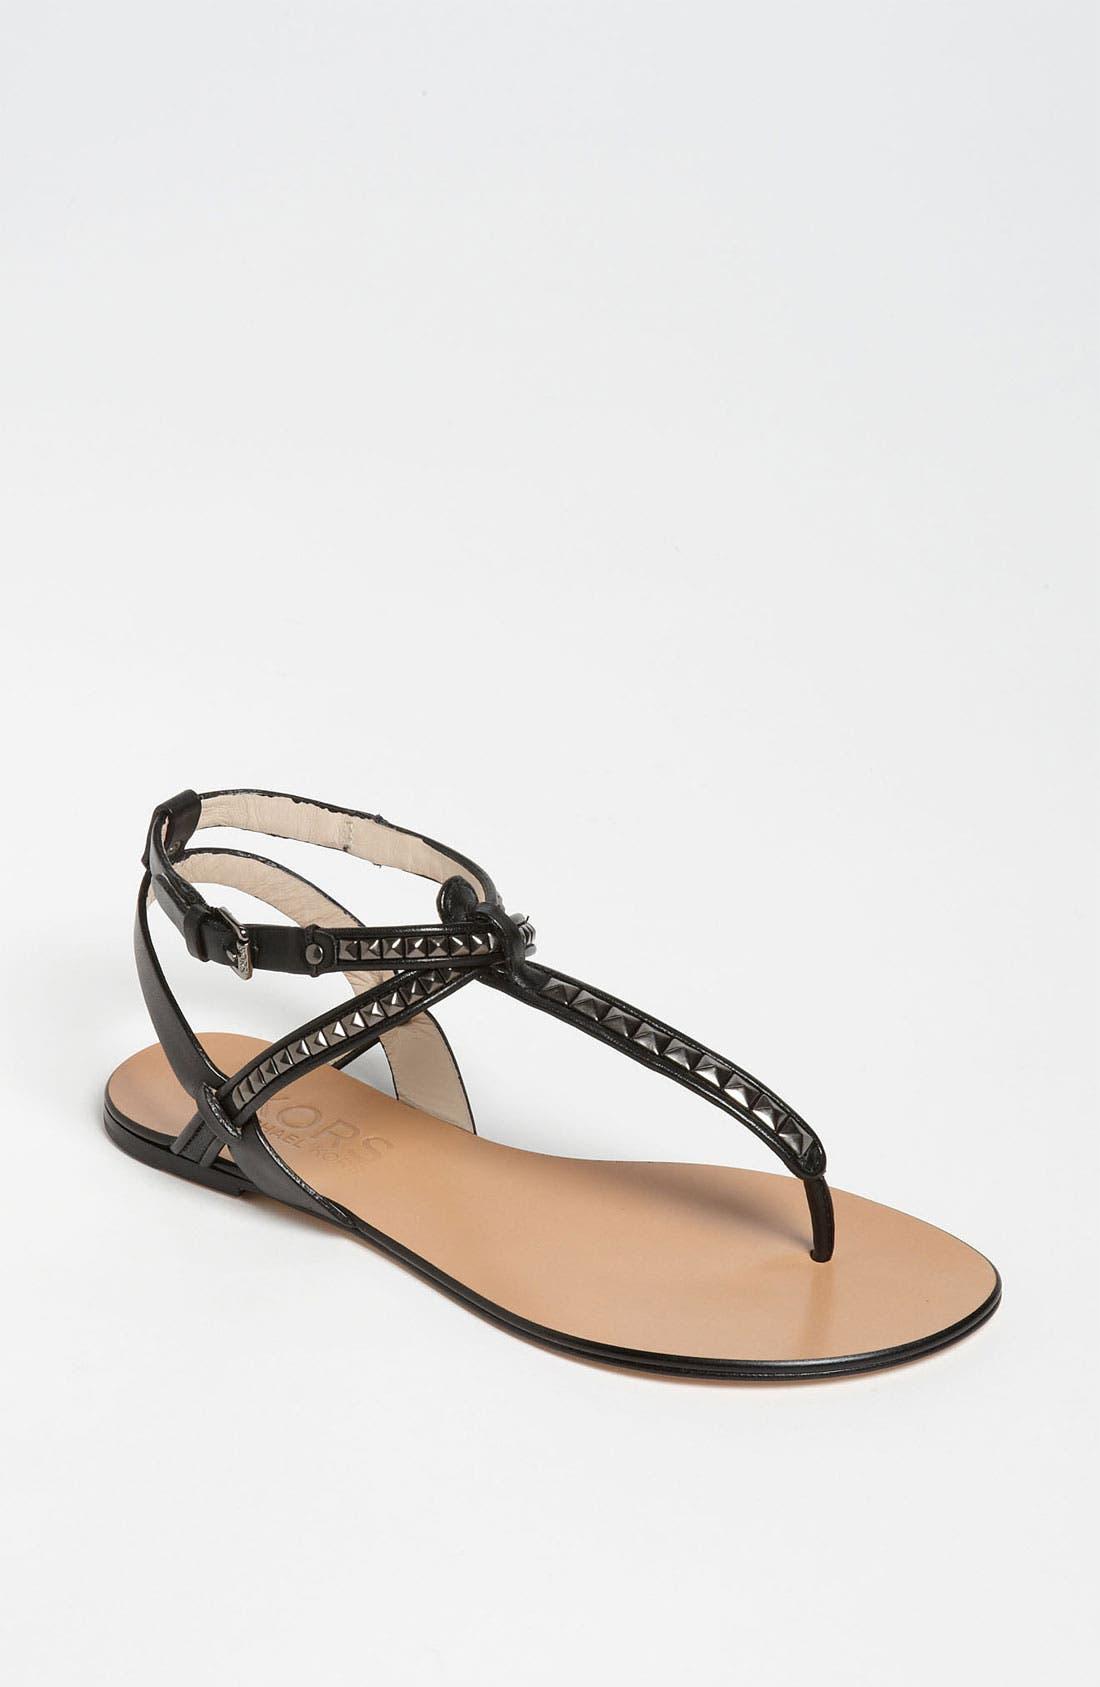 Alternate Image 1 Selected - KORS Michael Kors 'Jaina' Sandal